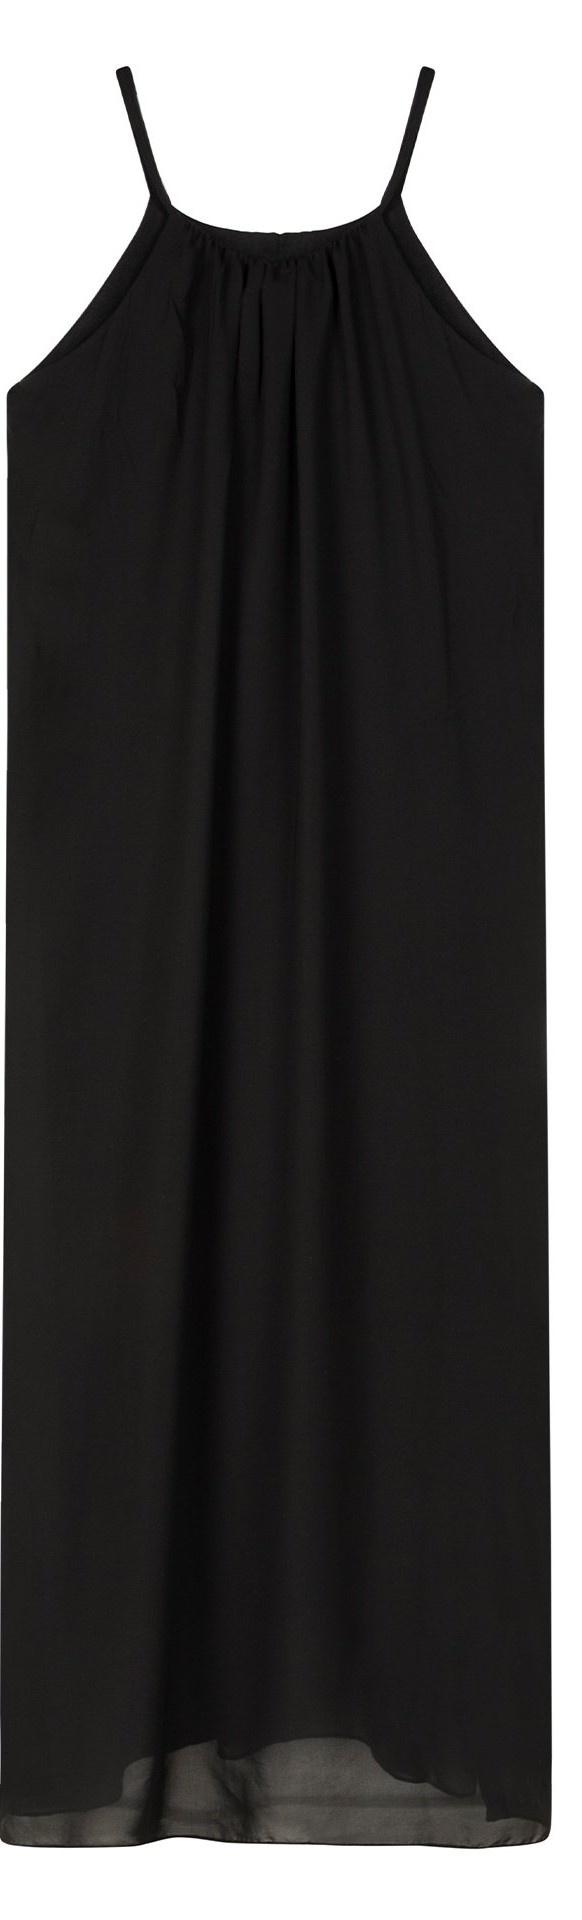 Jurk strappy dress layers black-3